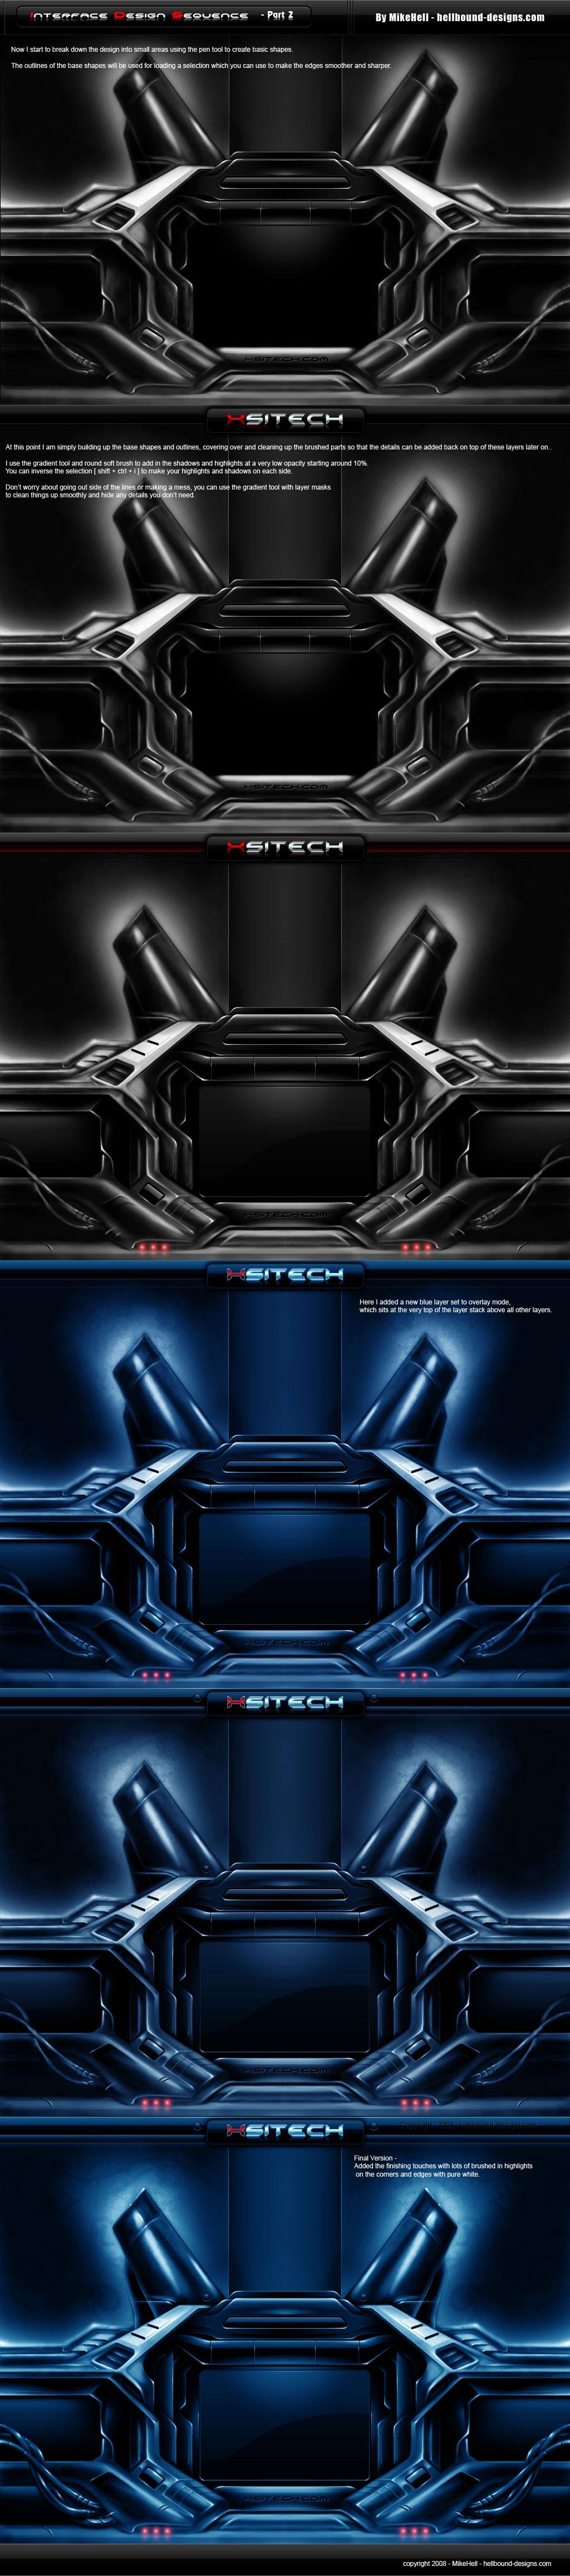 Interface Design Sequence Pt2